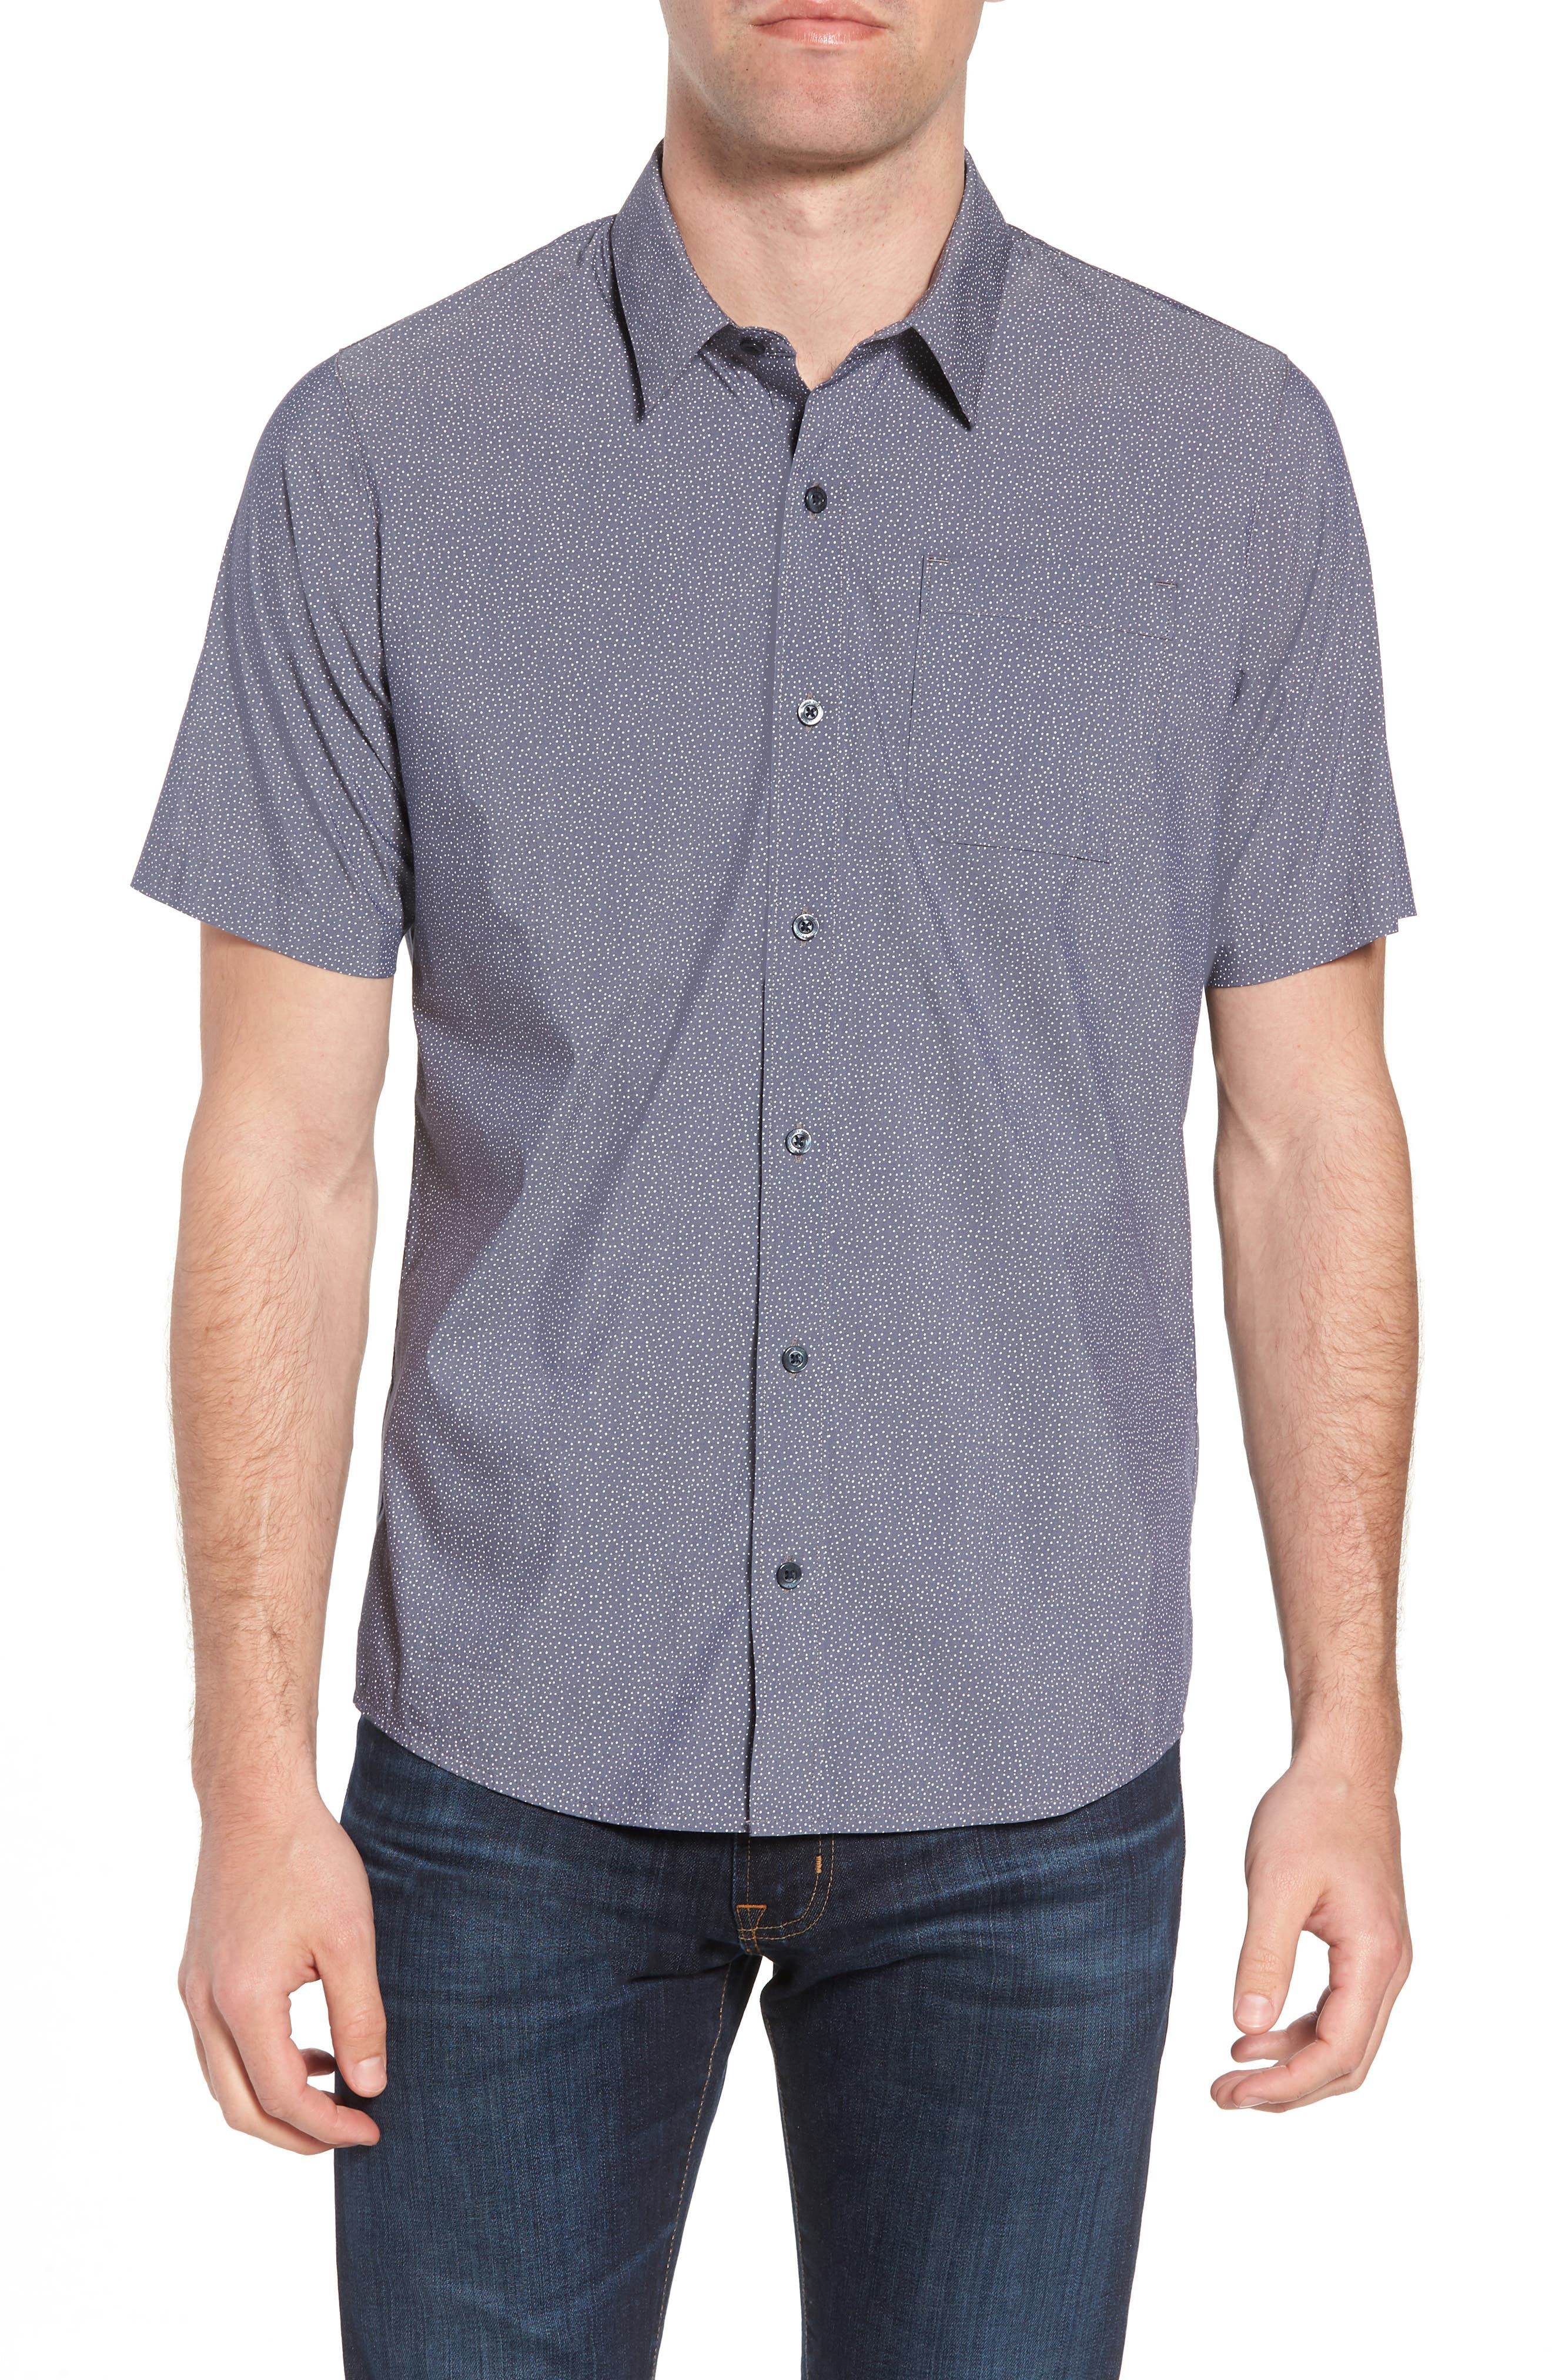 Particles Spot Print Sport Shirt,                             Main thumbnail 1, color,                             400